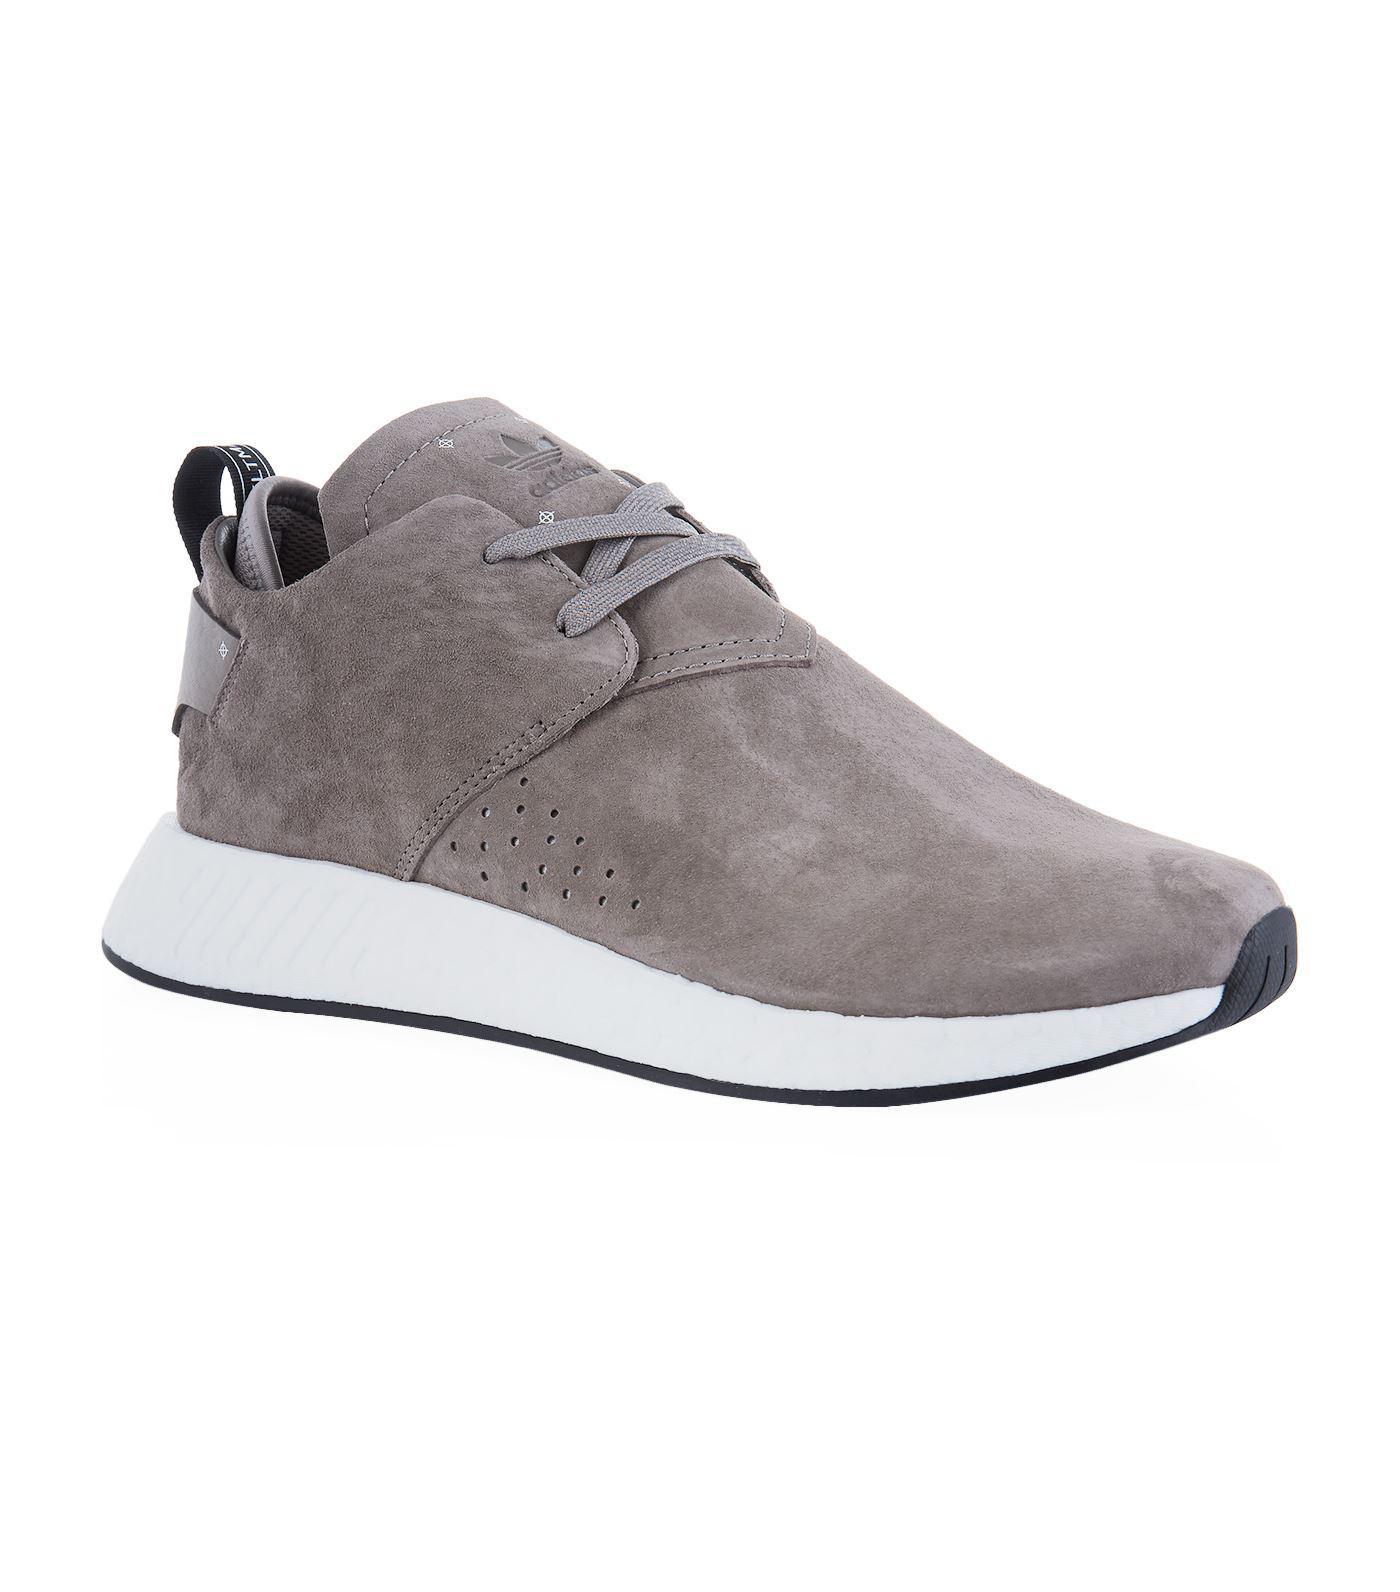 f845cbdb7105a Lyst - adidas Originals Nmd C2 Sneakers